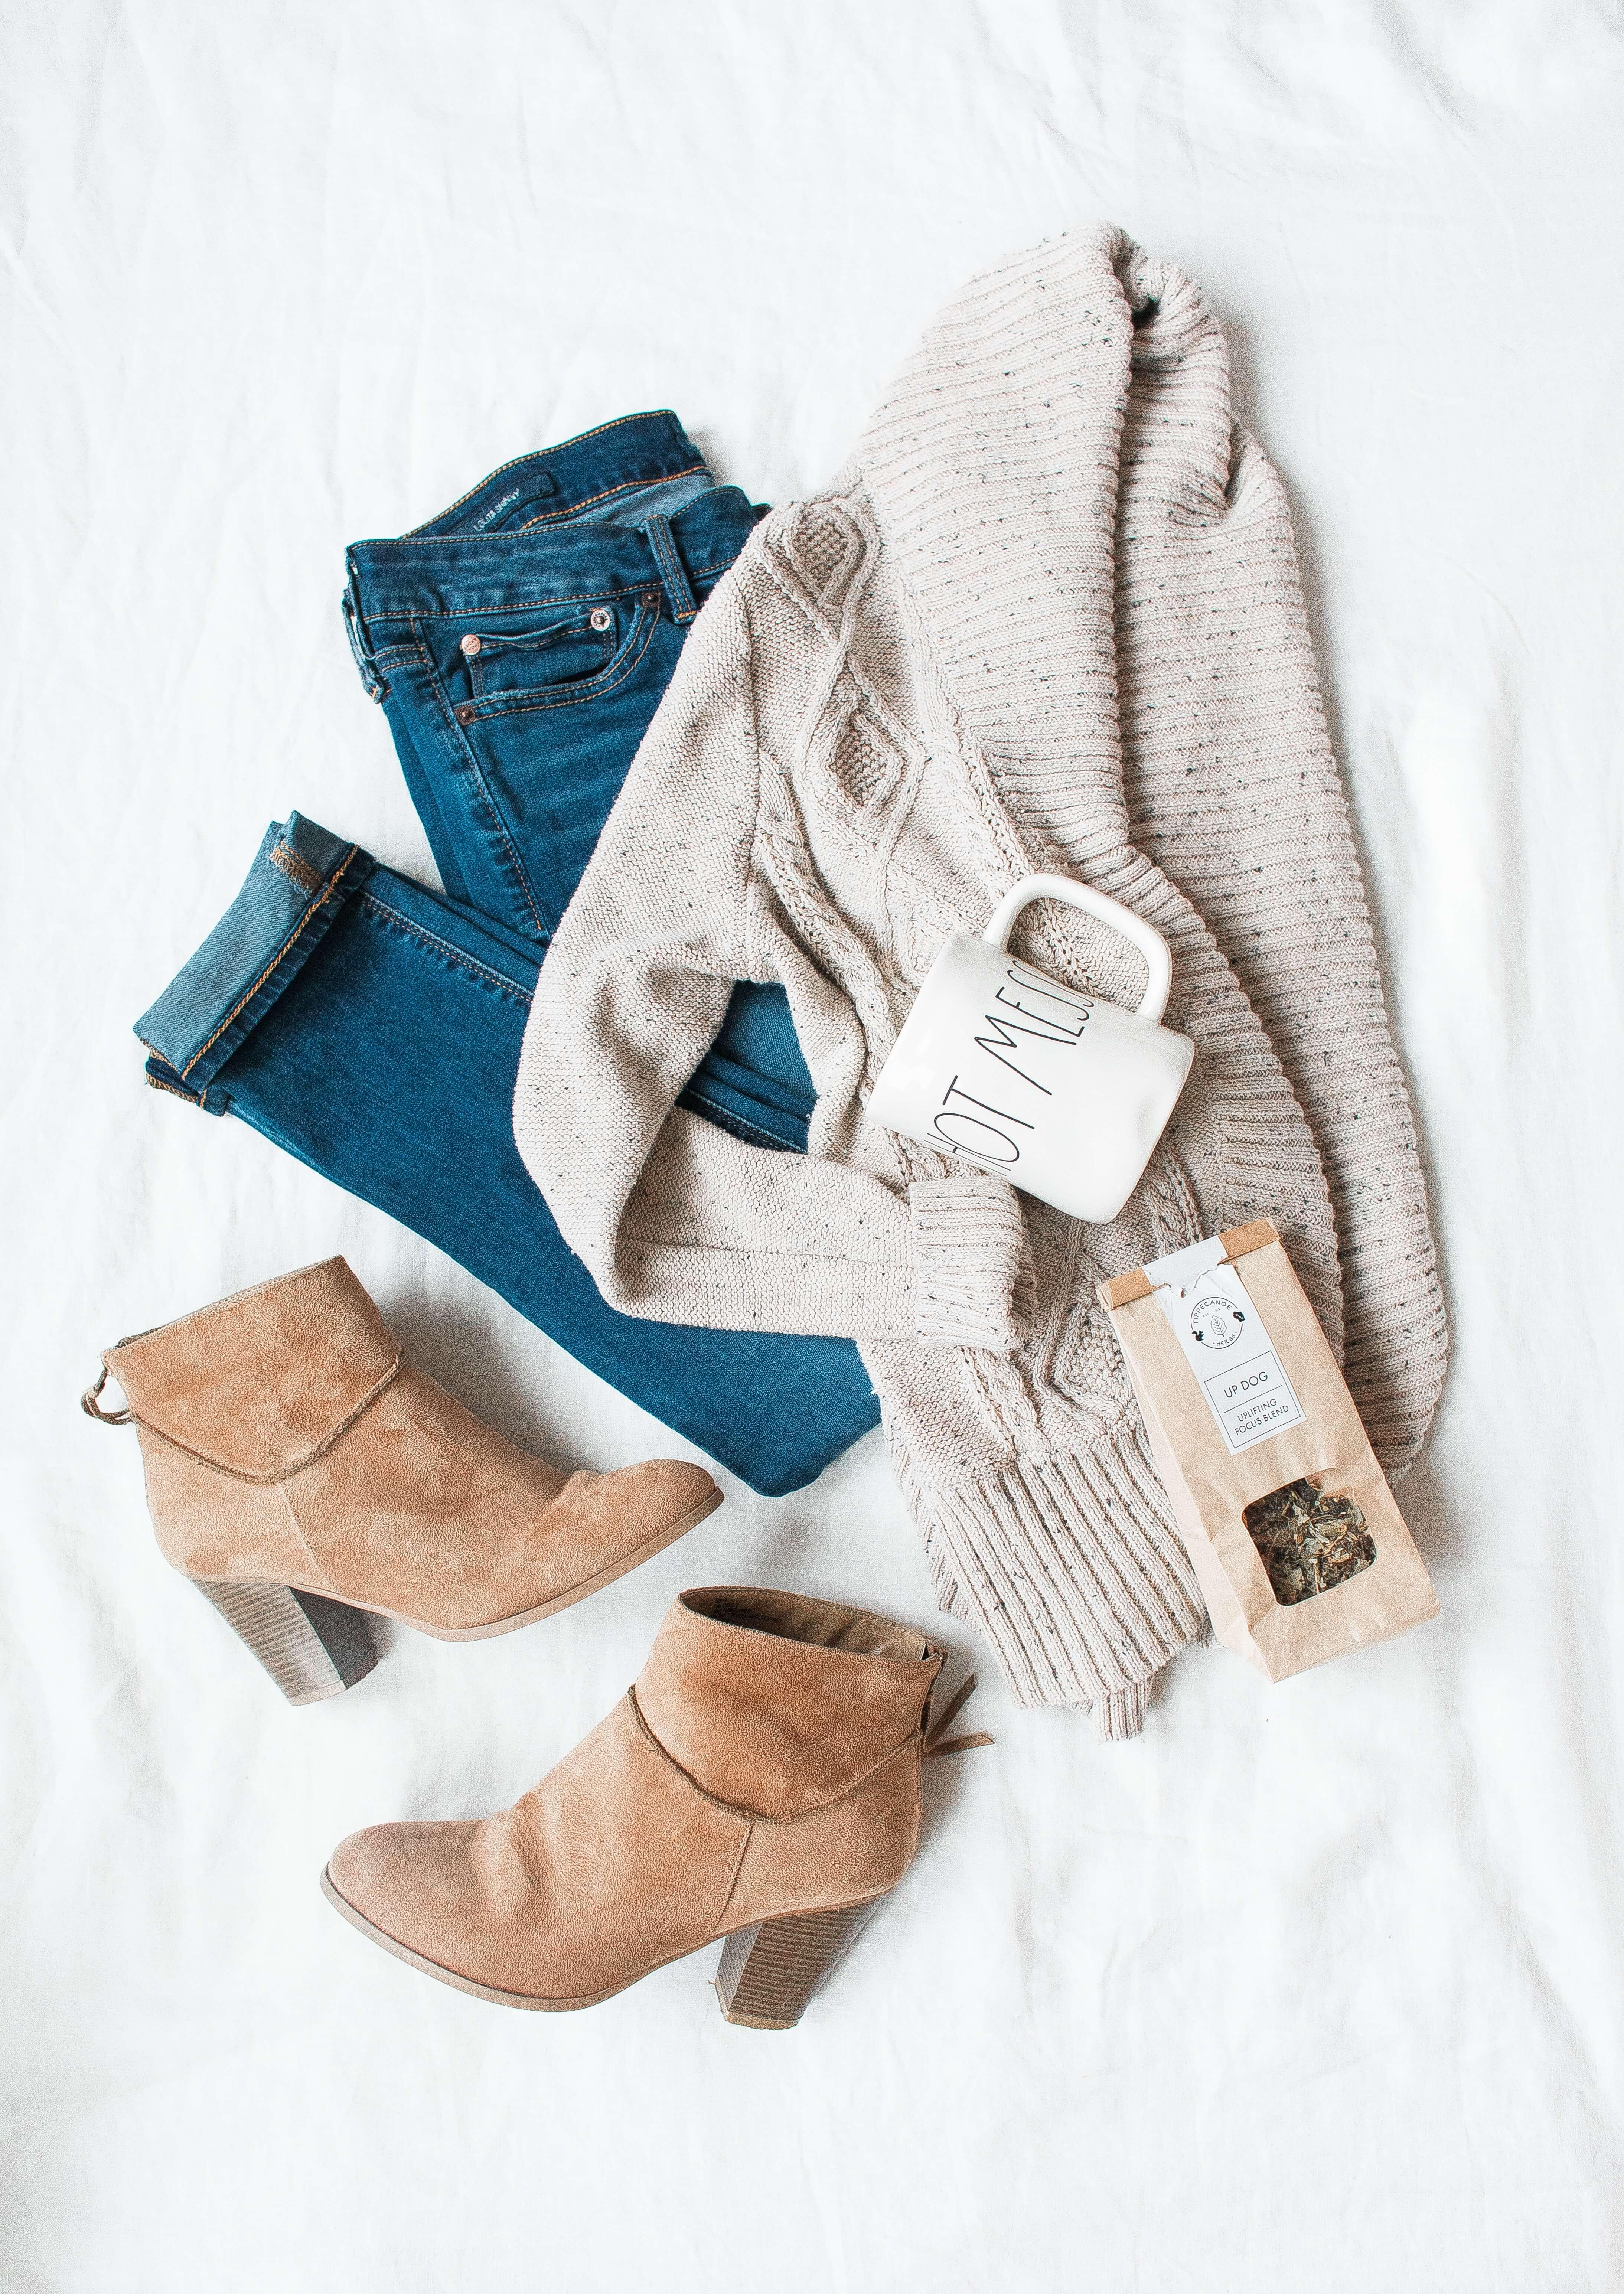 flatly clothes